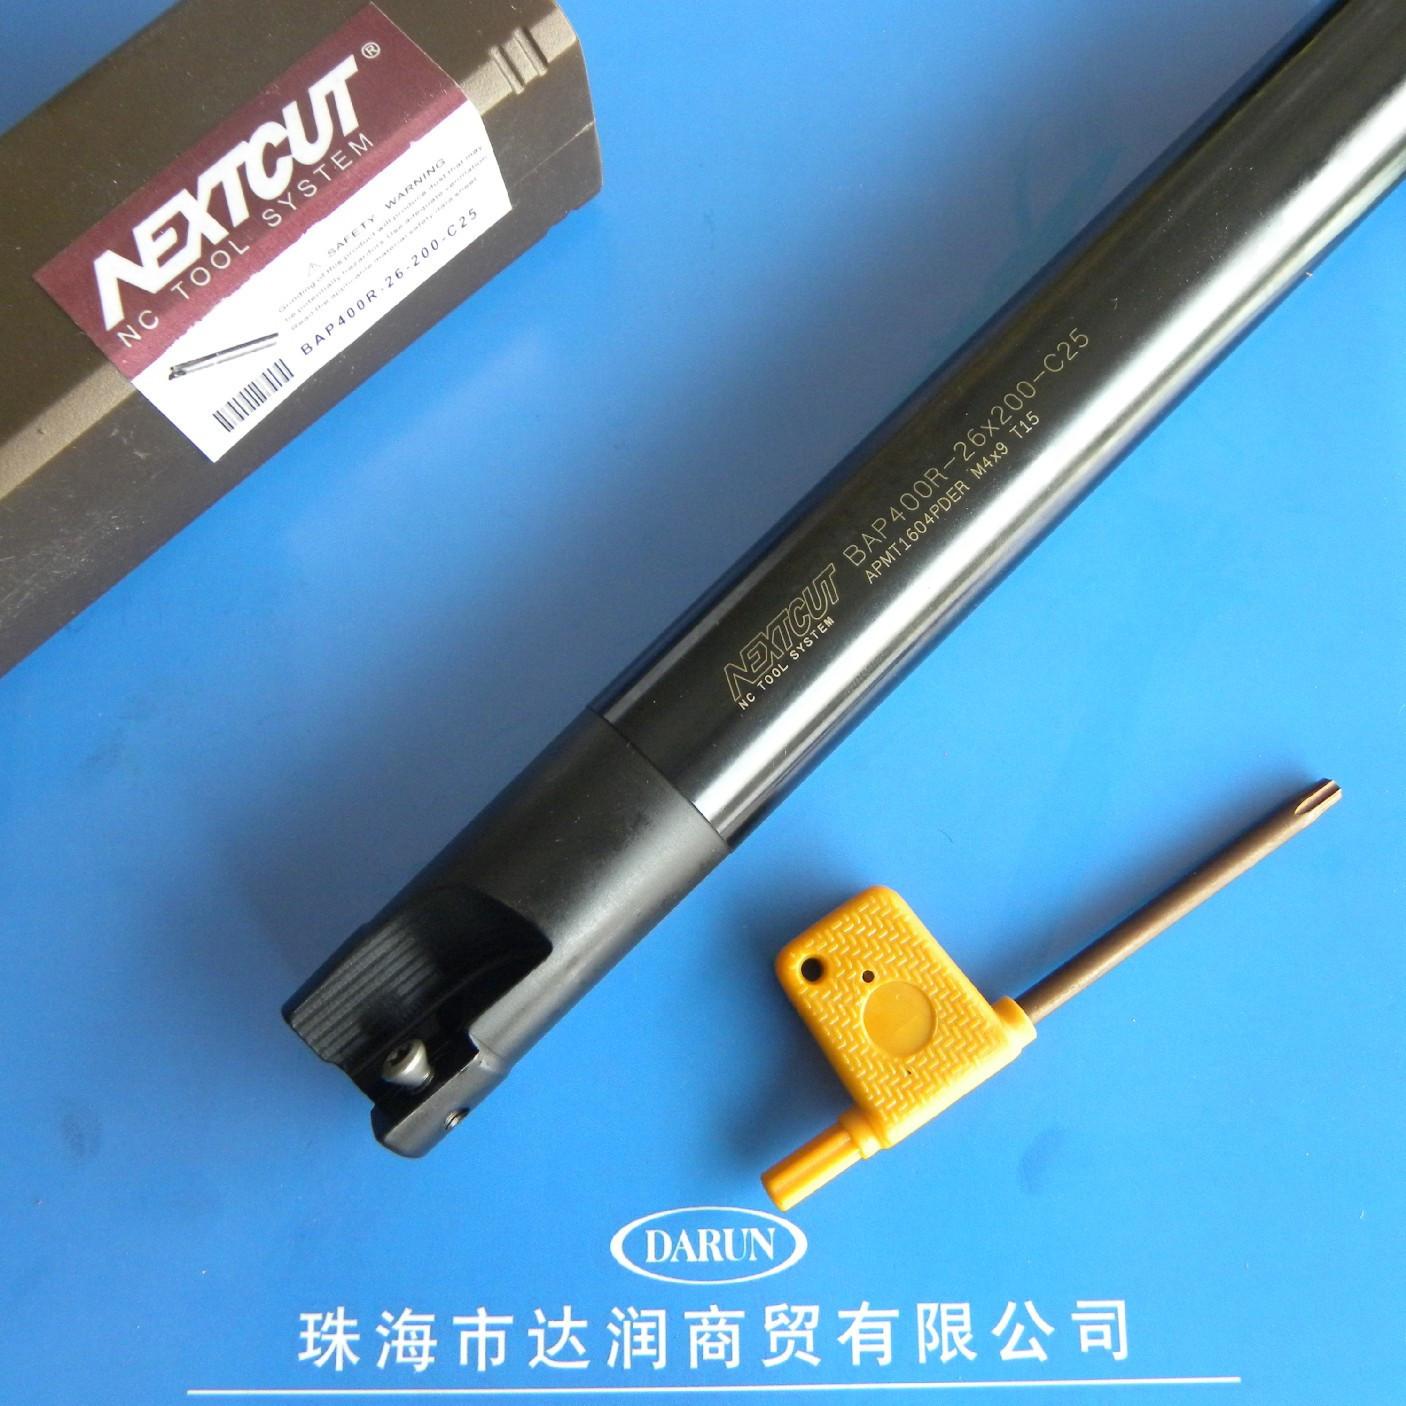 Наборы ножей для кухни Артикул 8552456062